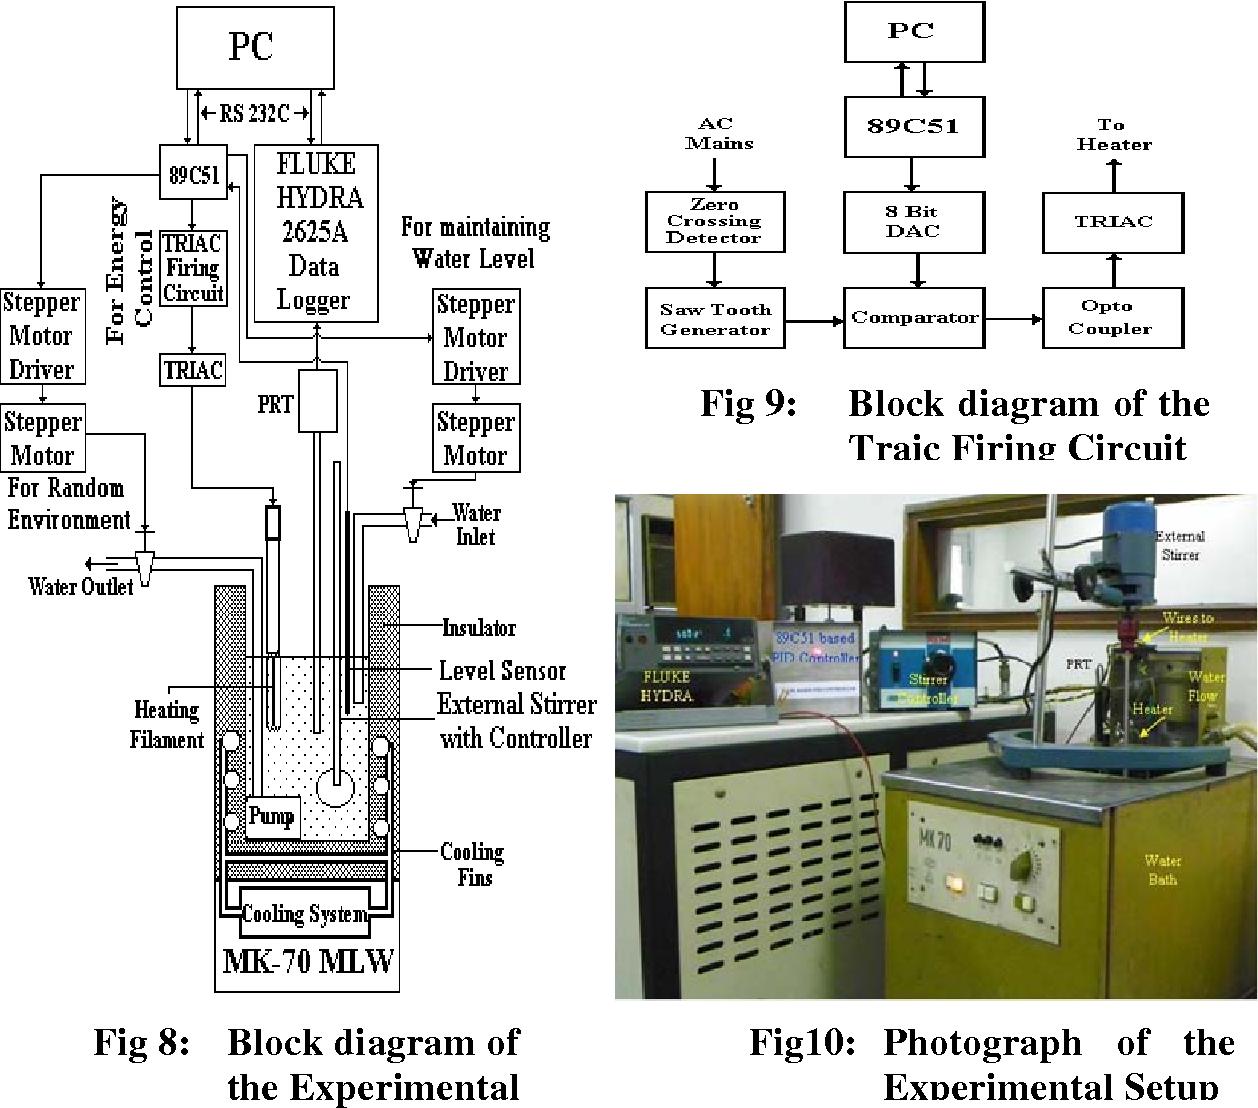 Adaptive Tuning Of Pid Controller For A Nonlinear Constant Circuit Diagram 89c51 Temperature Water Bath Under Set Point Disturbances Using Ganfc Semantic Scholar